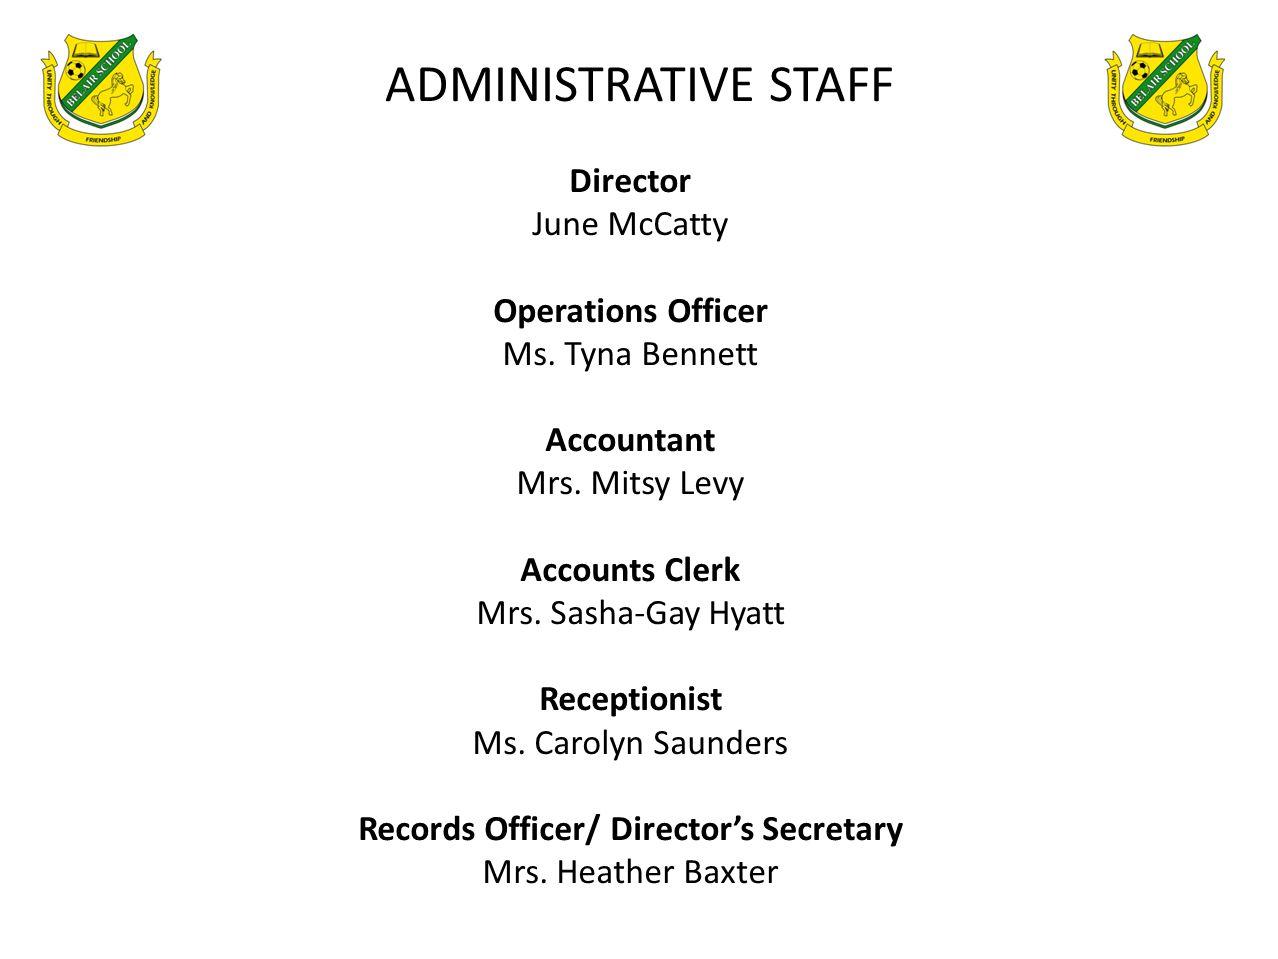 Records Officer/ Director's Secretary